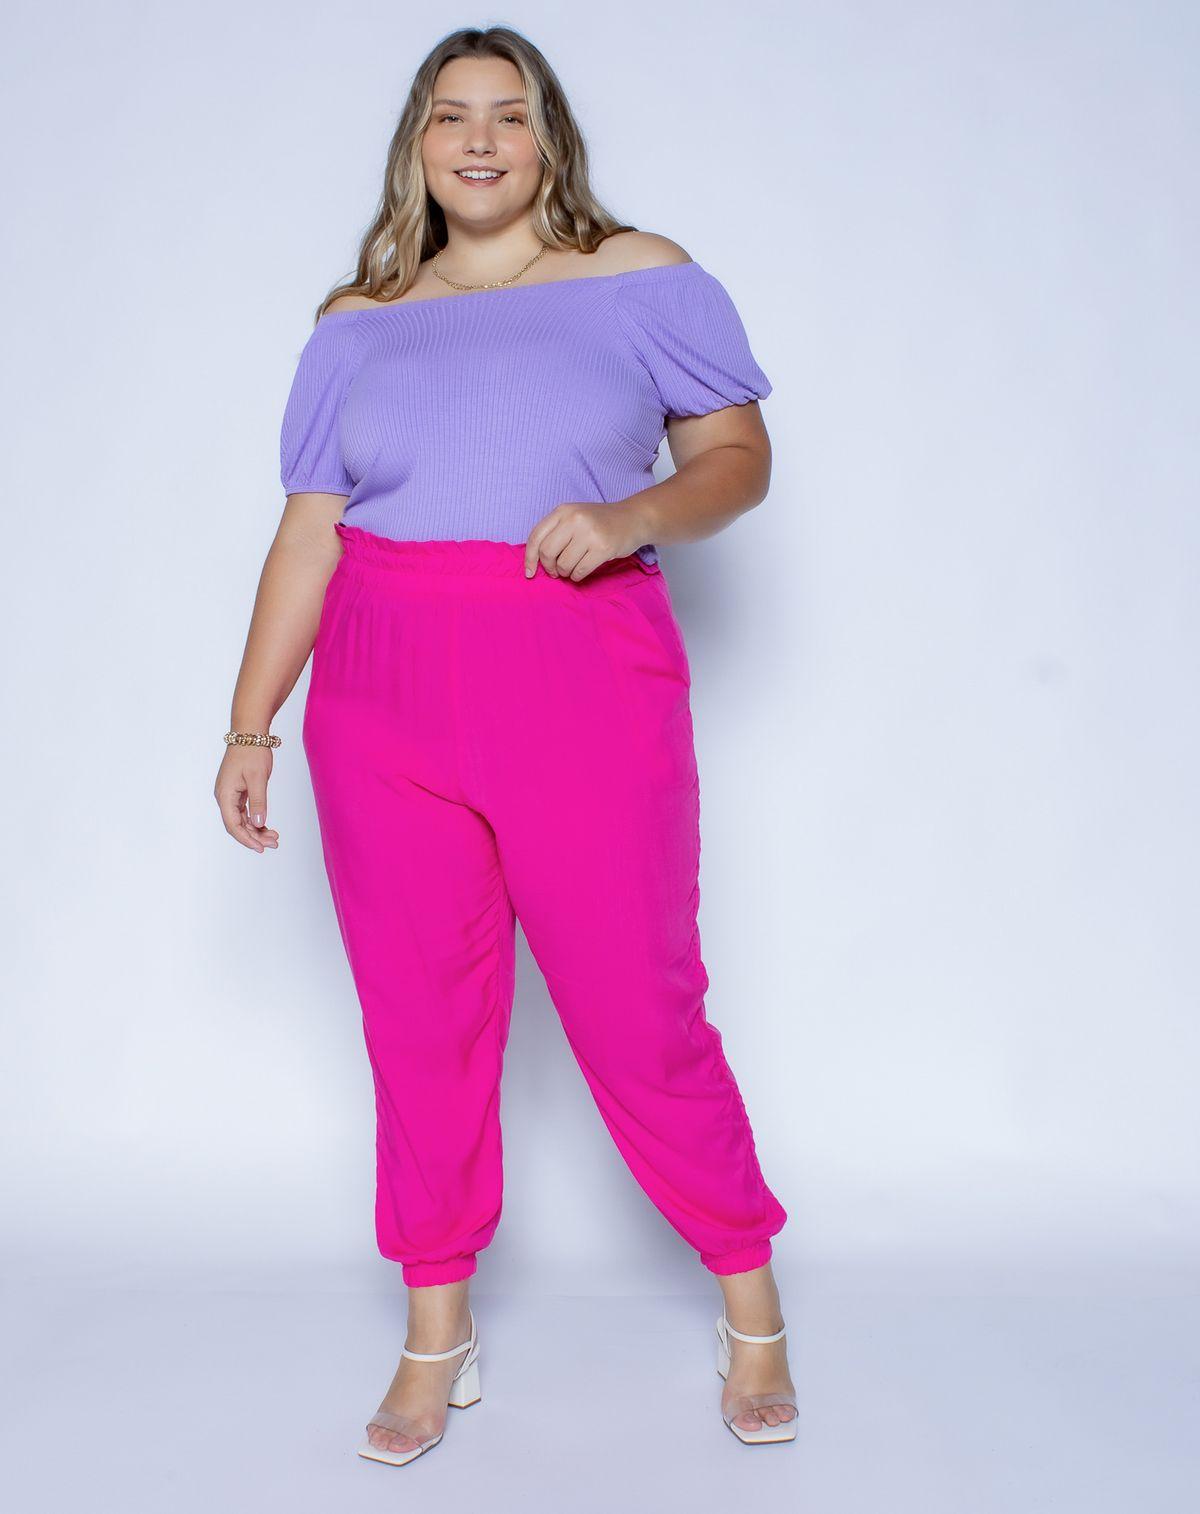 600395002-calca-plus-size-feminina-jogger-basica-pink-g2-128